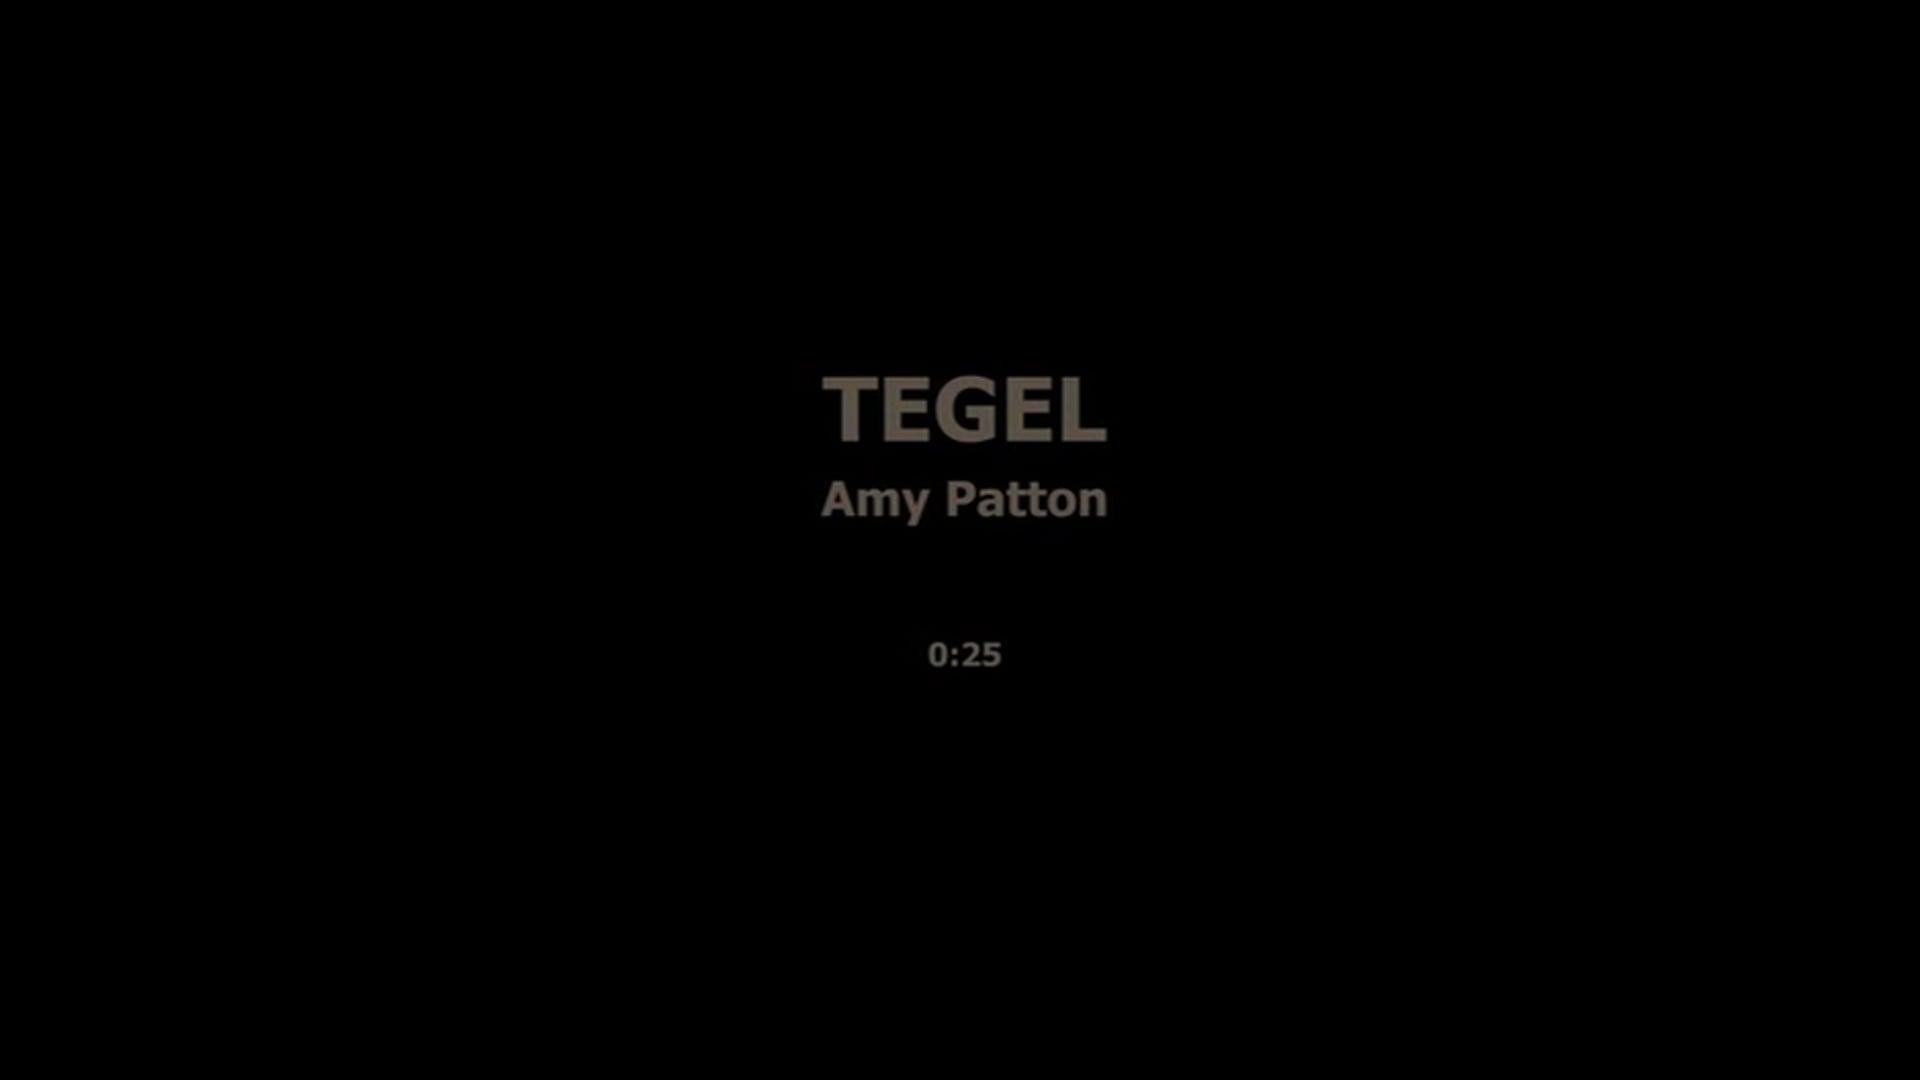 TEGEL - AMY PATTON